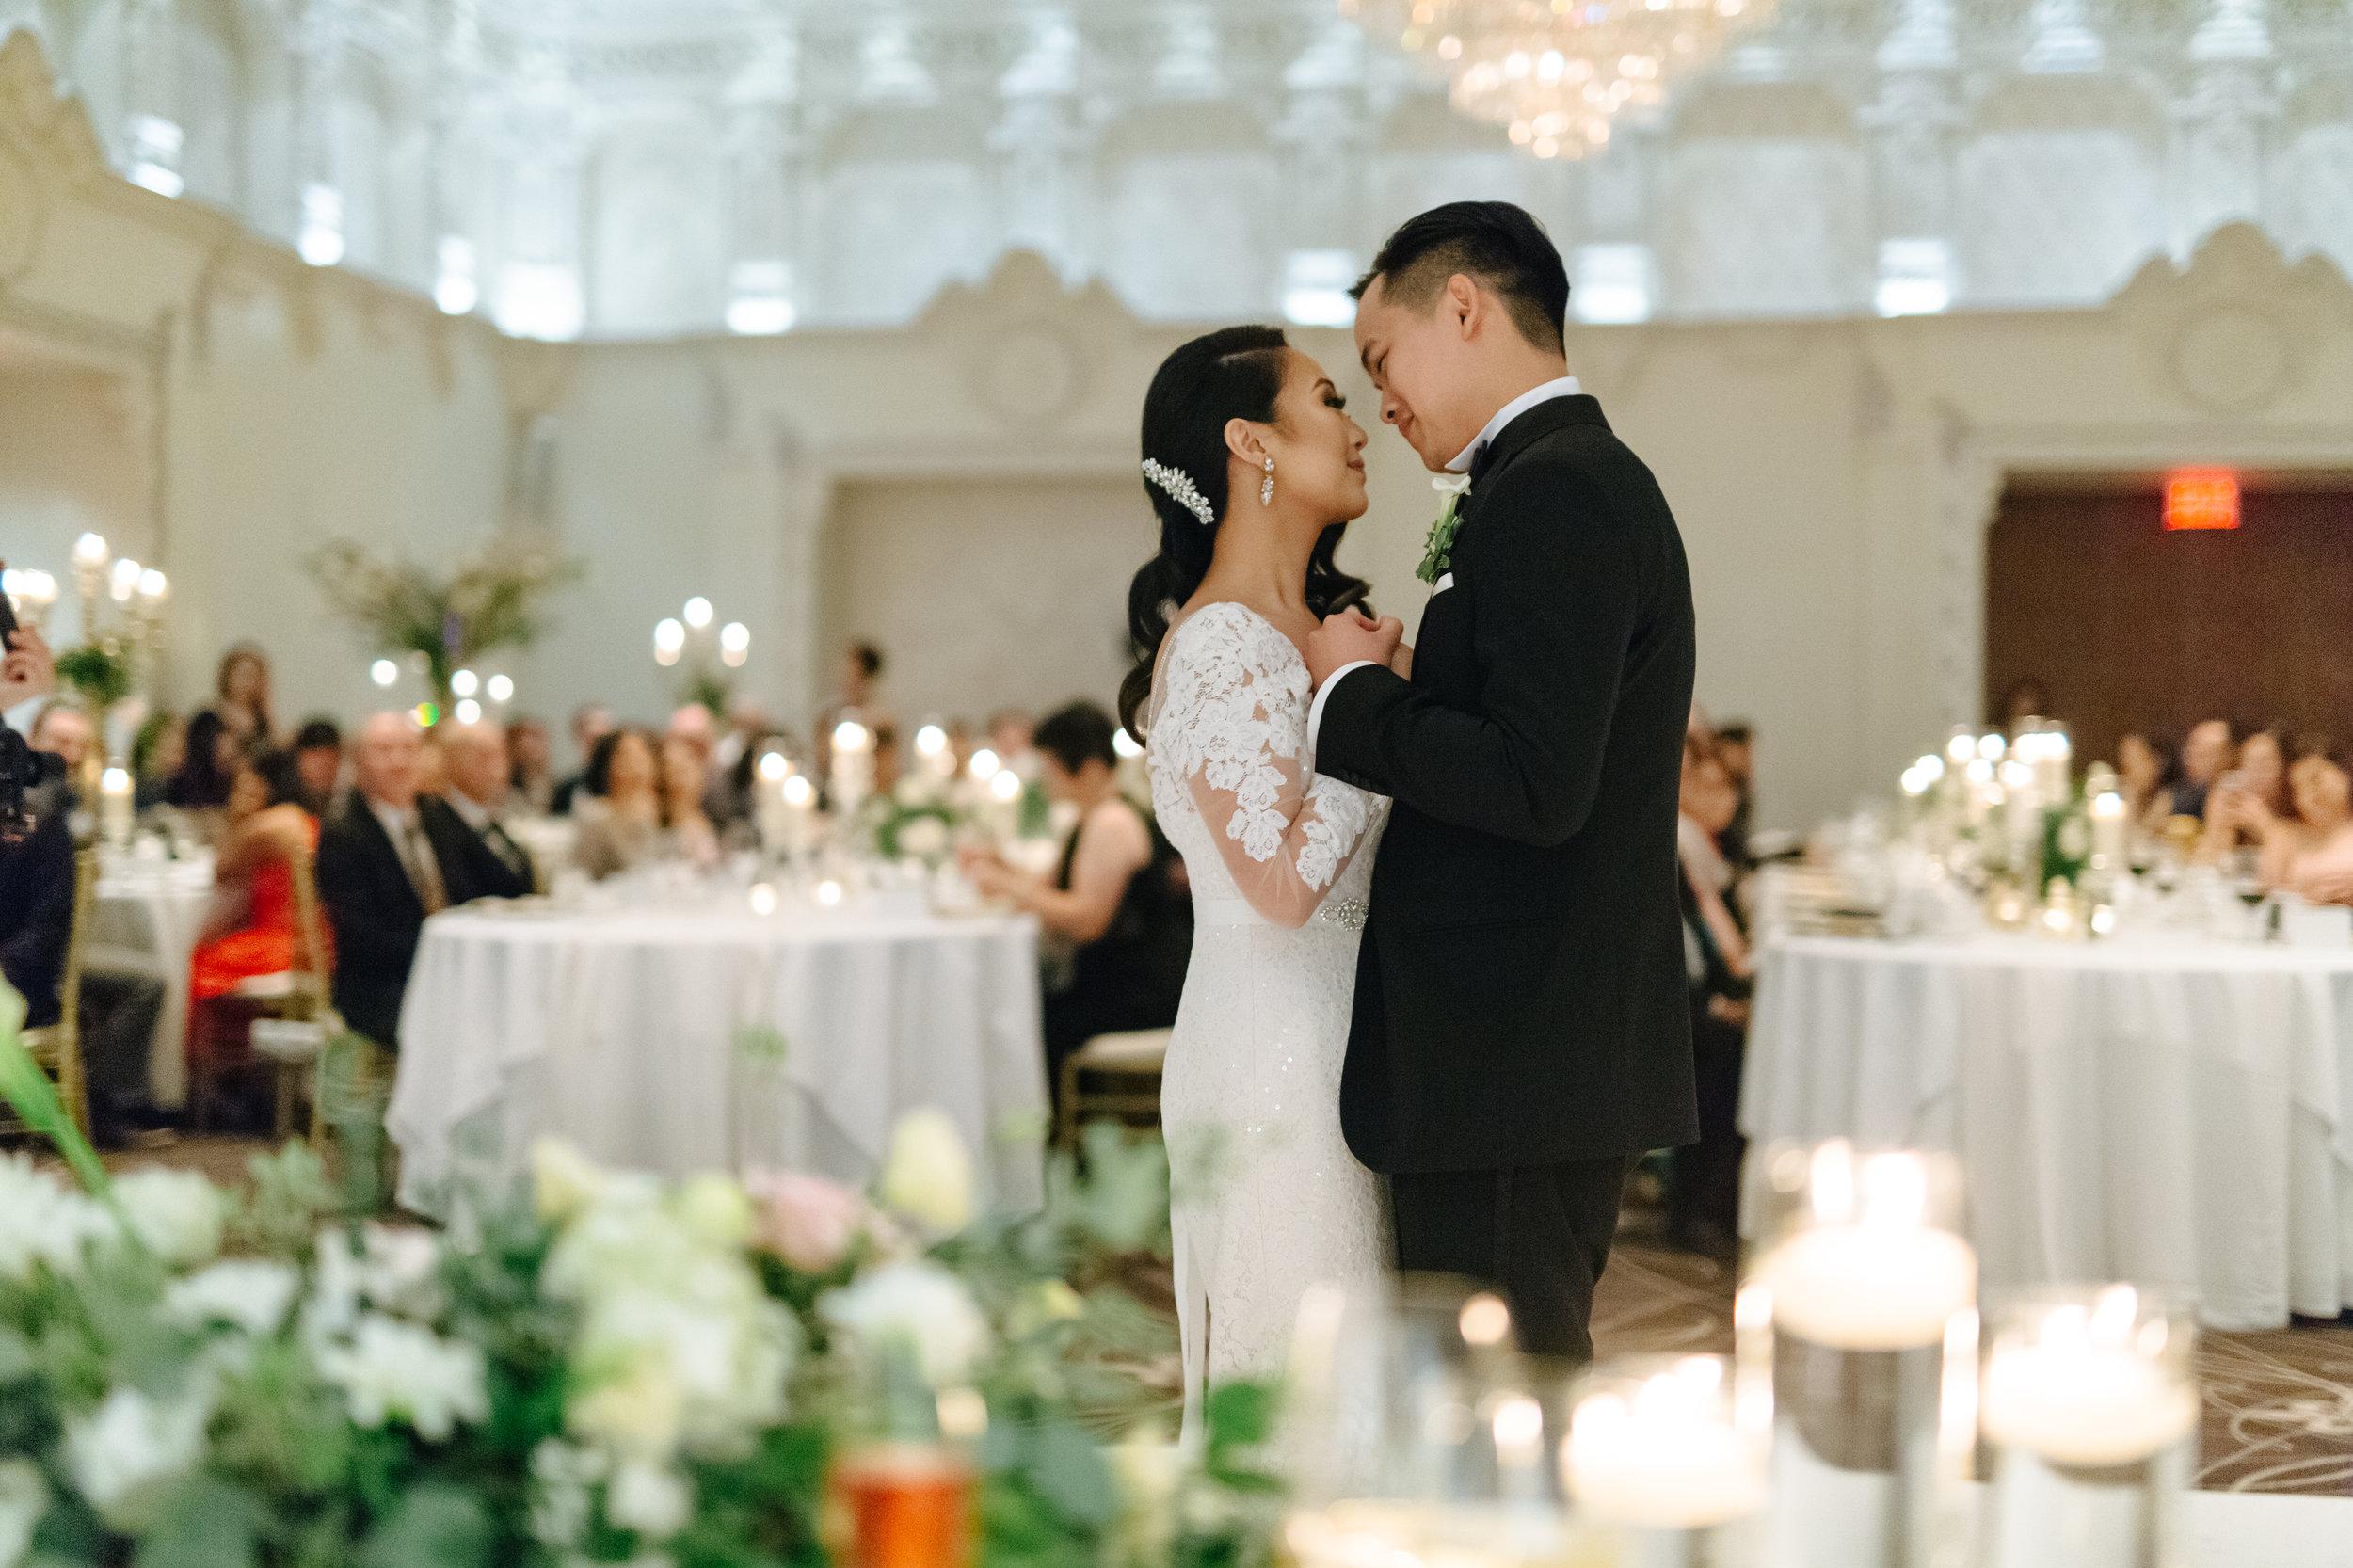 herastudios_wedding_carmen_jayjay_hera_selects-102.jpg